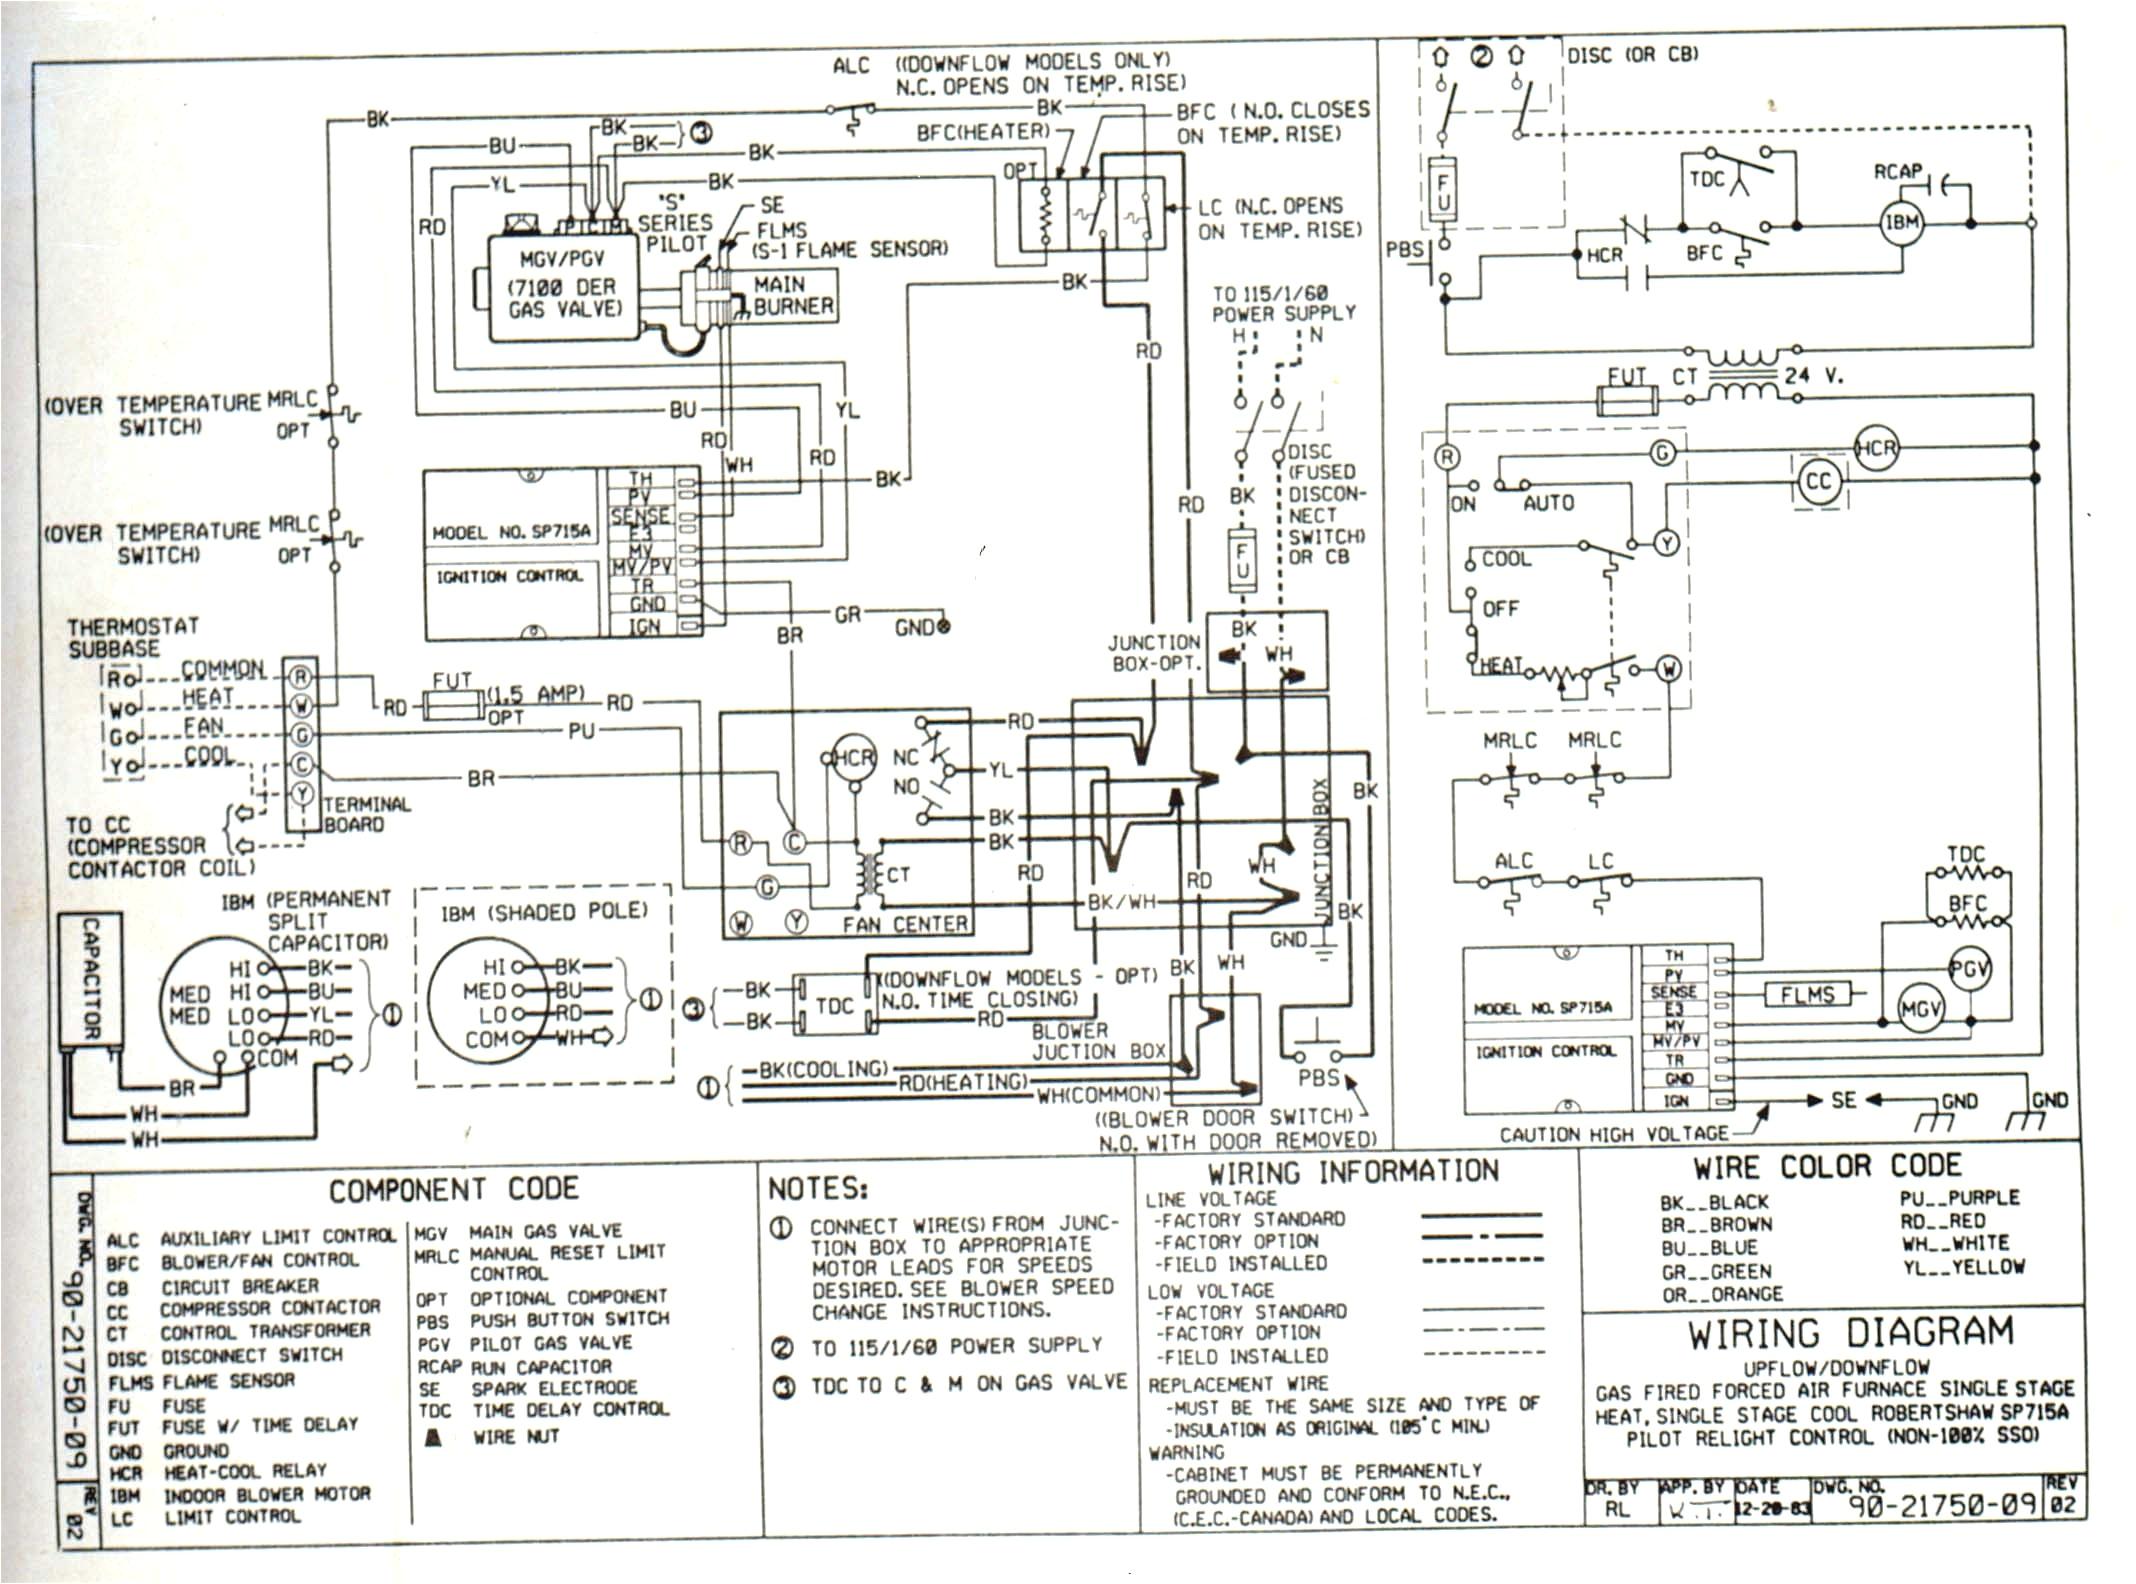 heat york diagram n wiring pump ahc1606a wiring diagram description wiring diagram for york heat pump to nest thermostat jpg